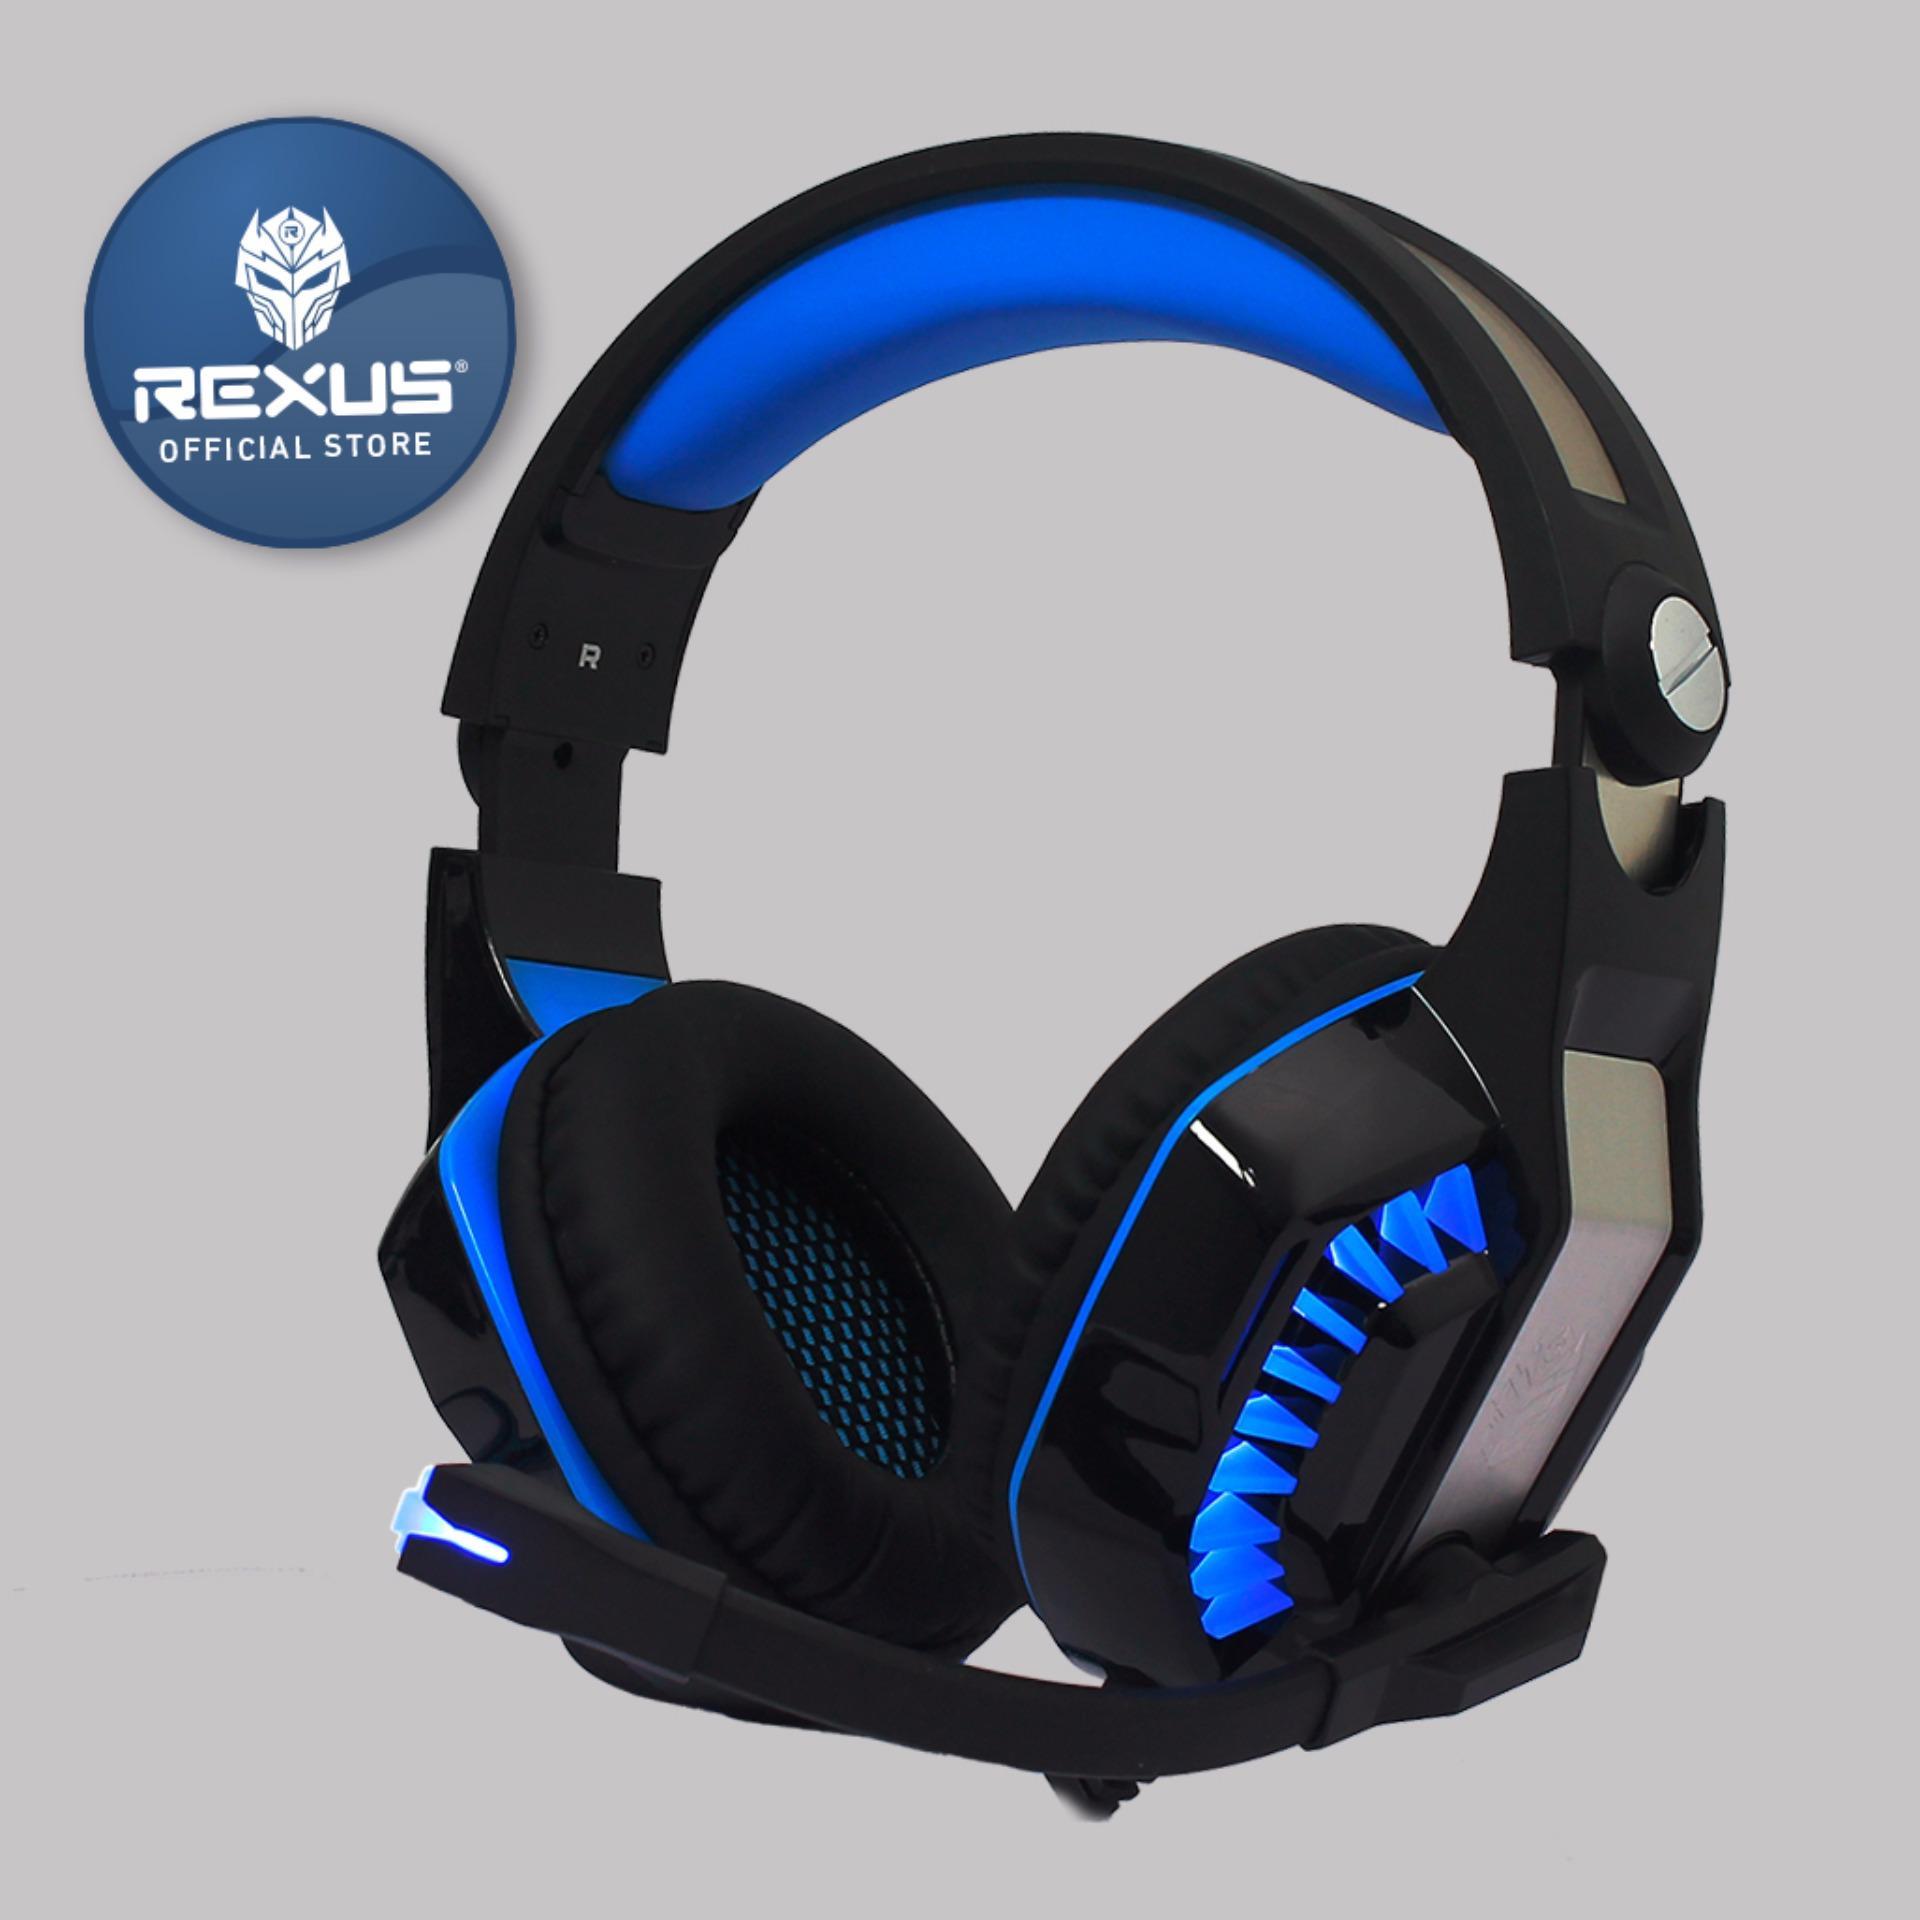 Rexus Headset Gaming HX2 Thundervox Rexus Headset Gaming HX2 Thundervox